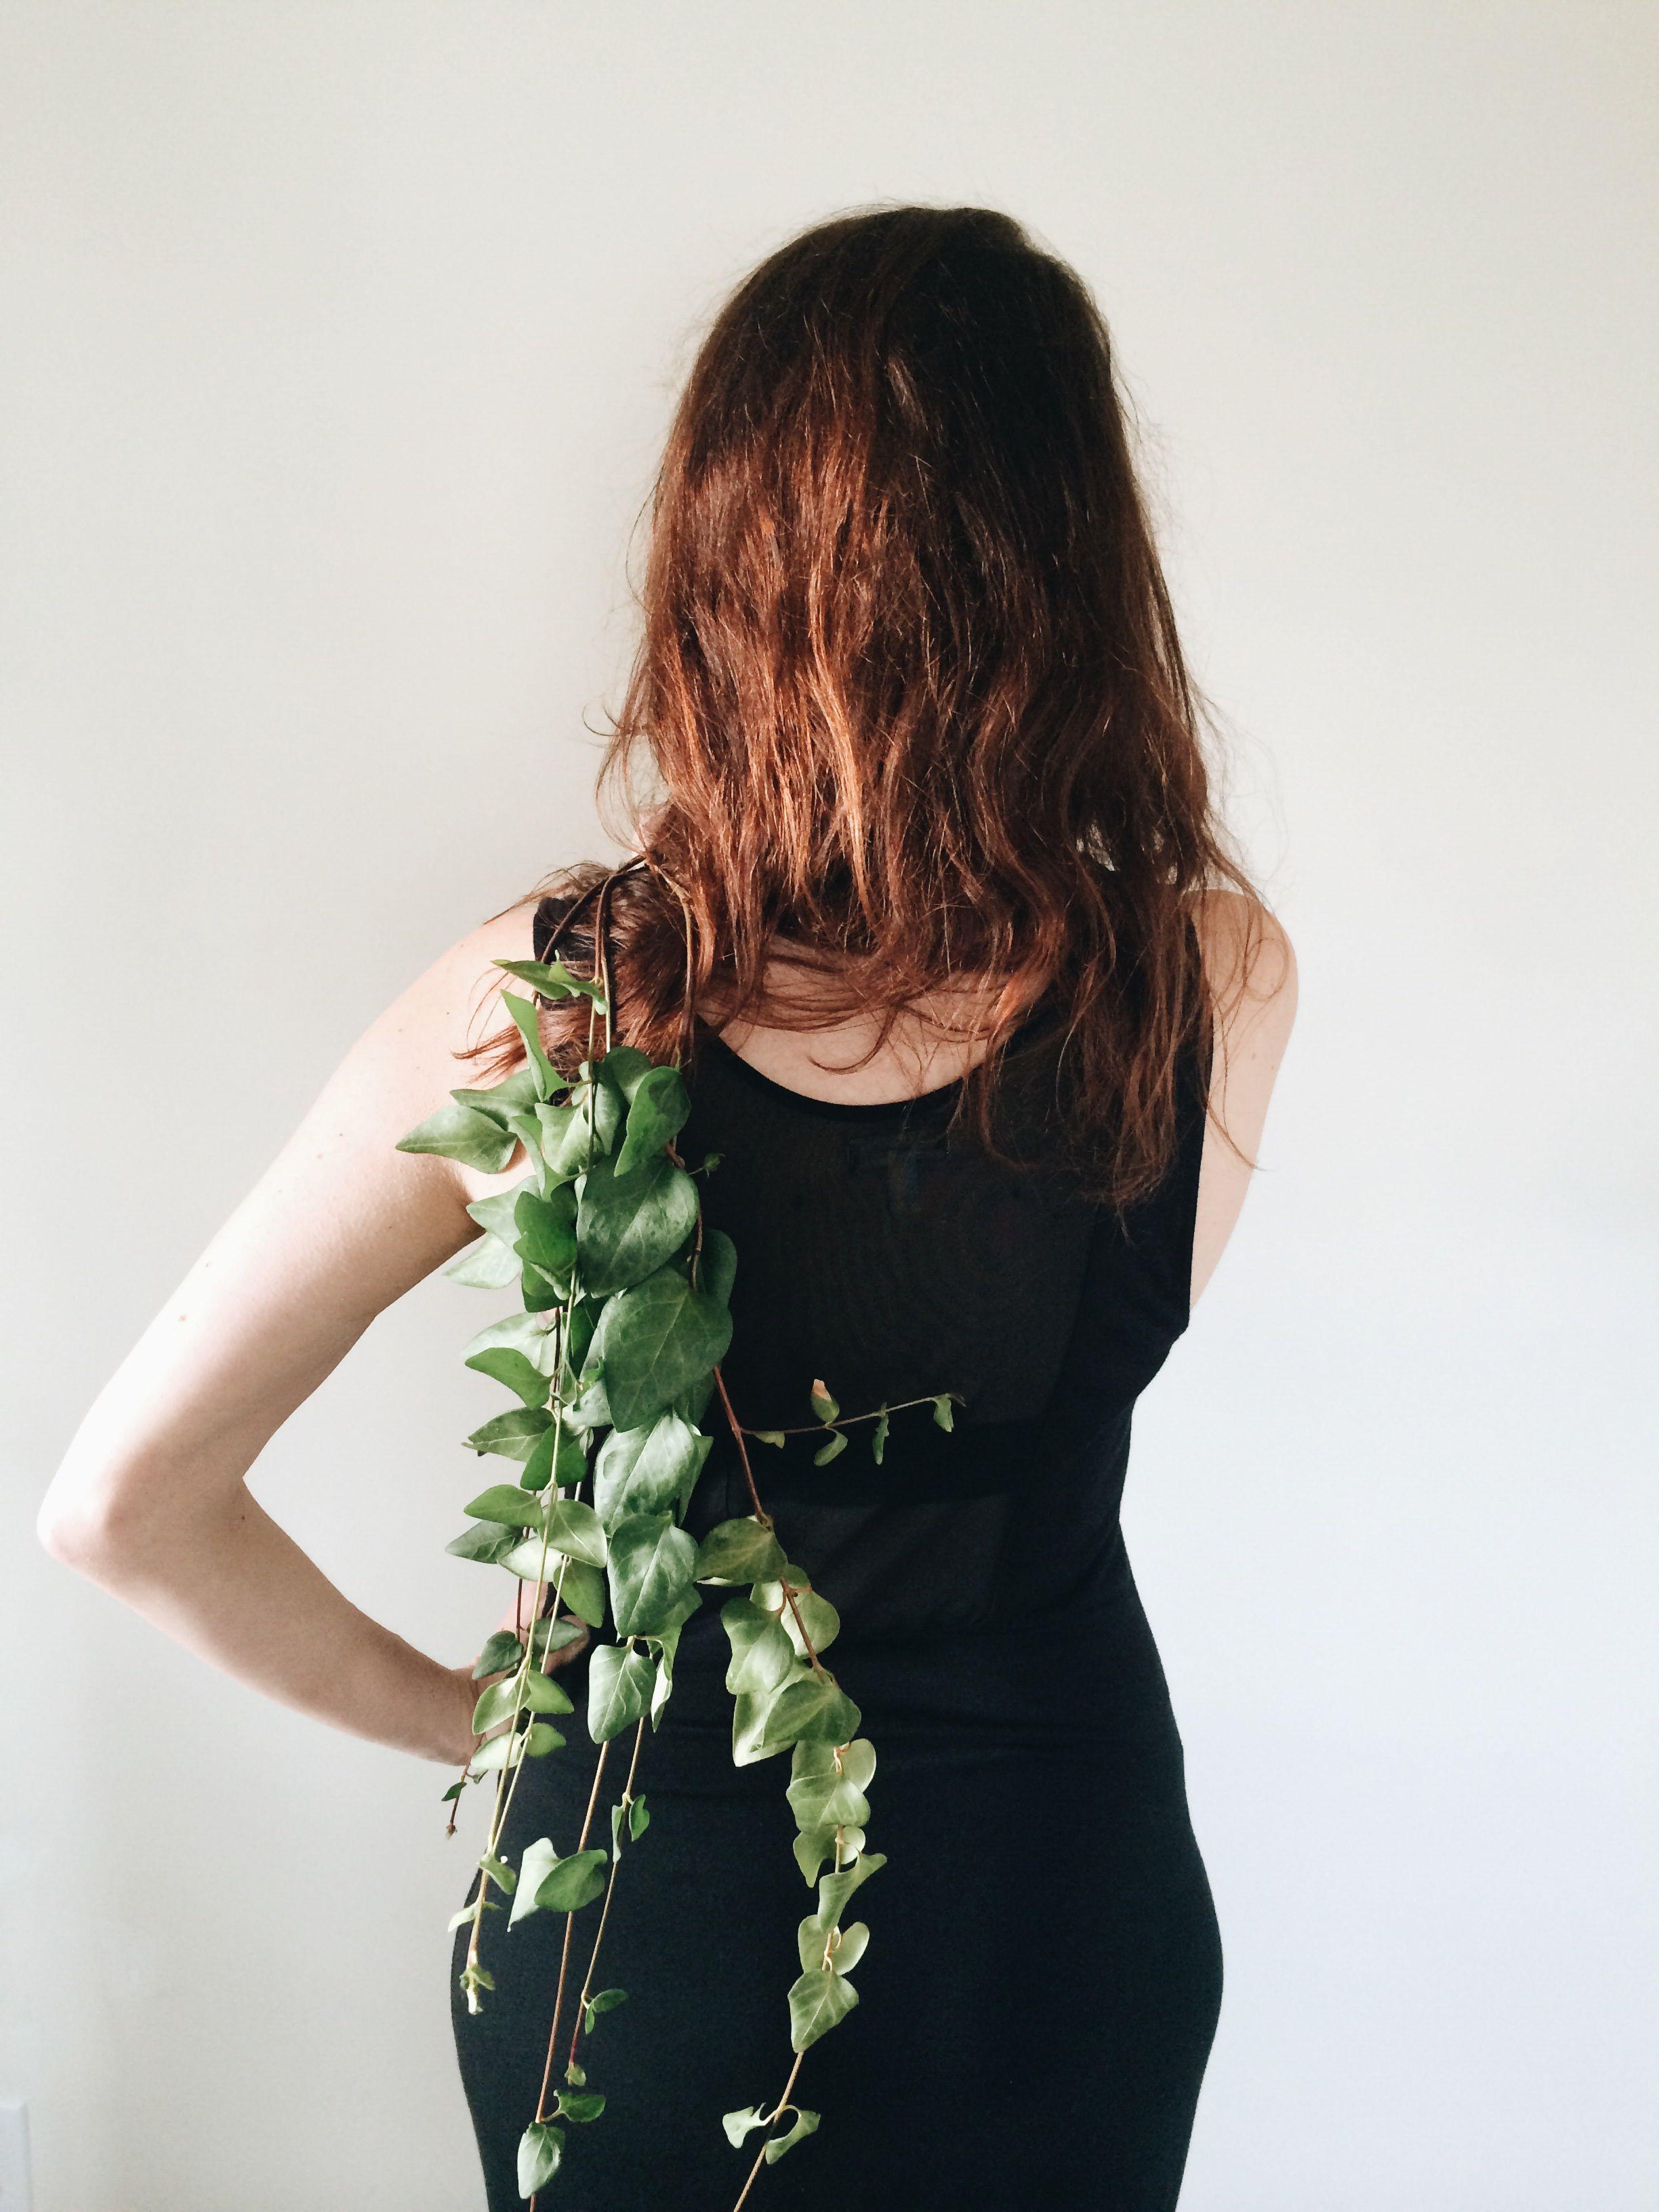 Instagram: @courtwilbur  A Plant Life Series